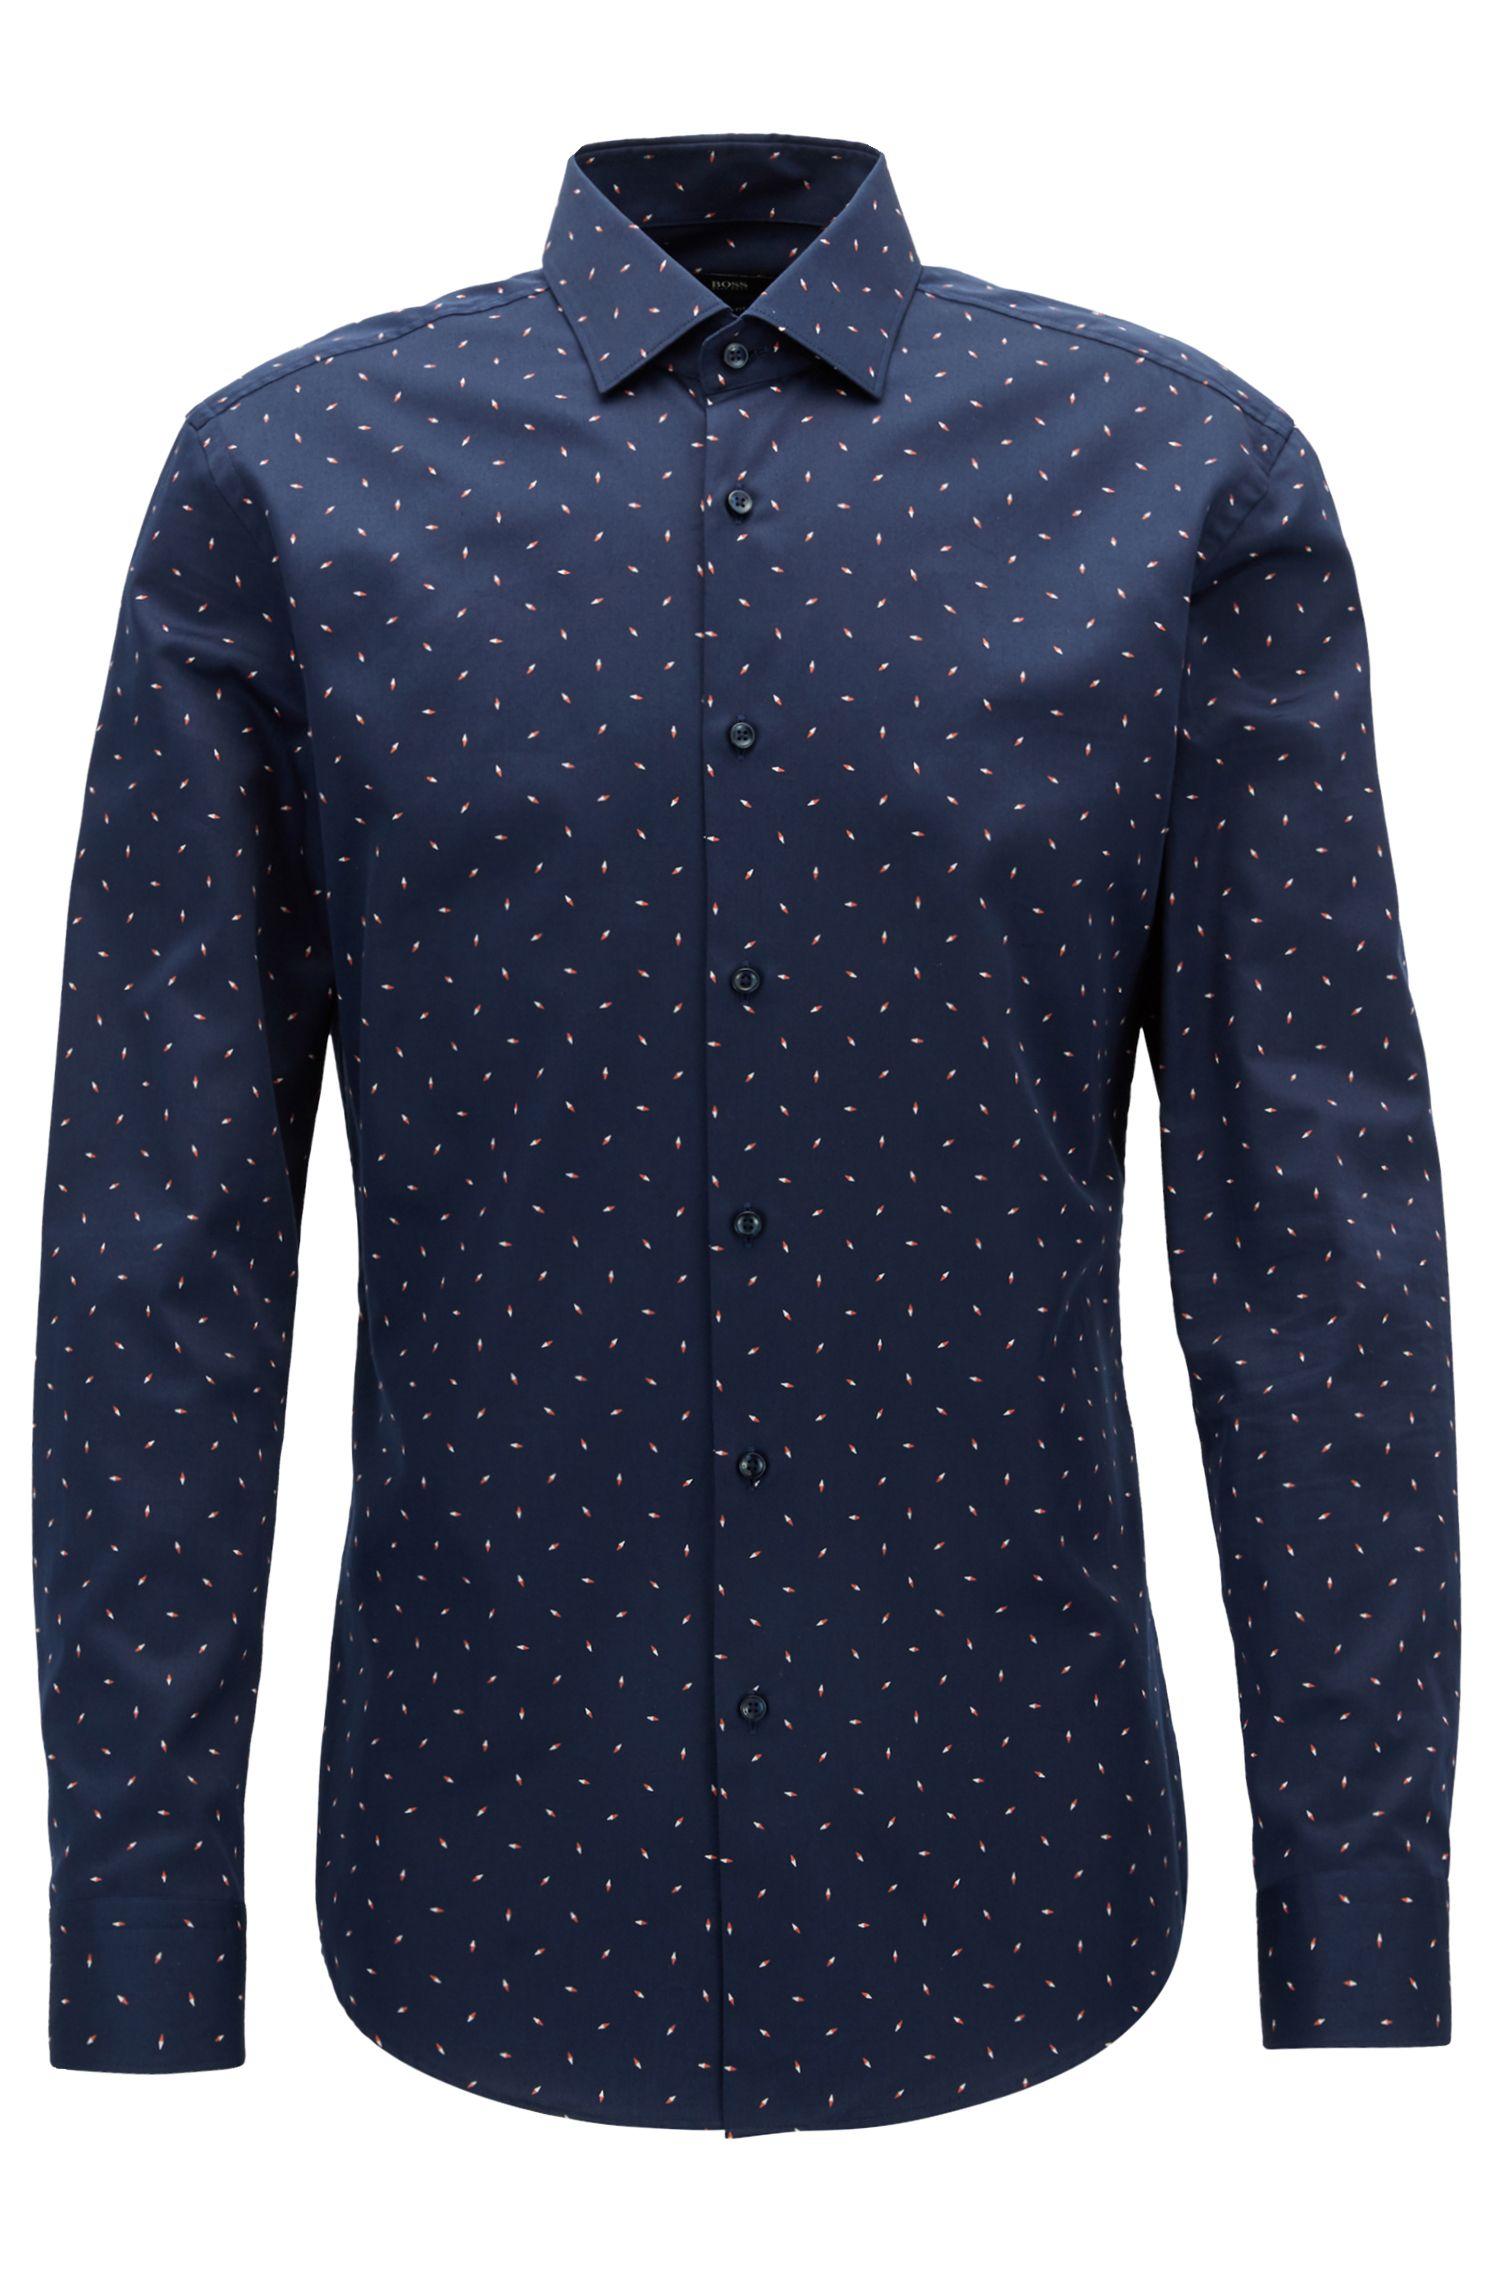 Slim-Fit Hemd ausBaumwoll-Satin mit durchgehendem Kompass-Print